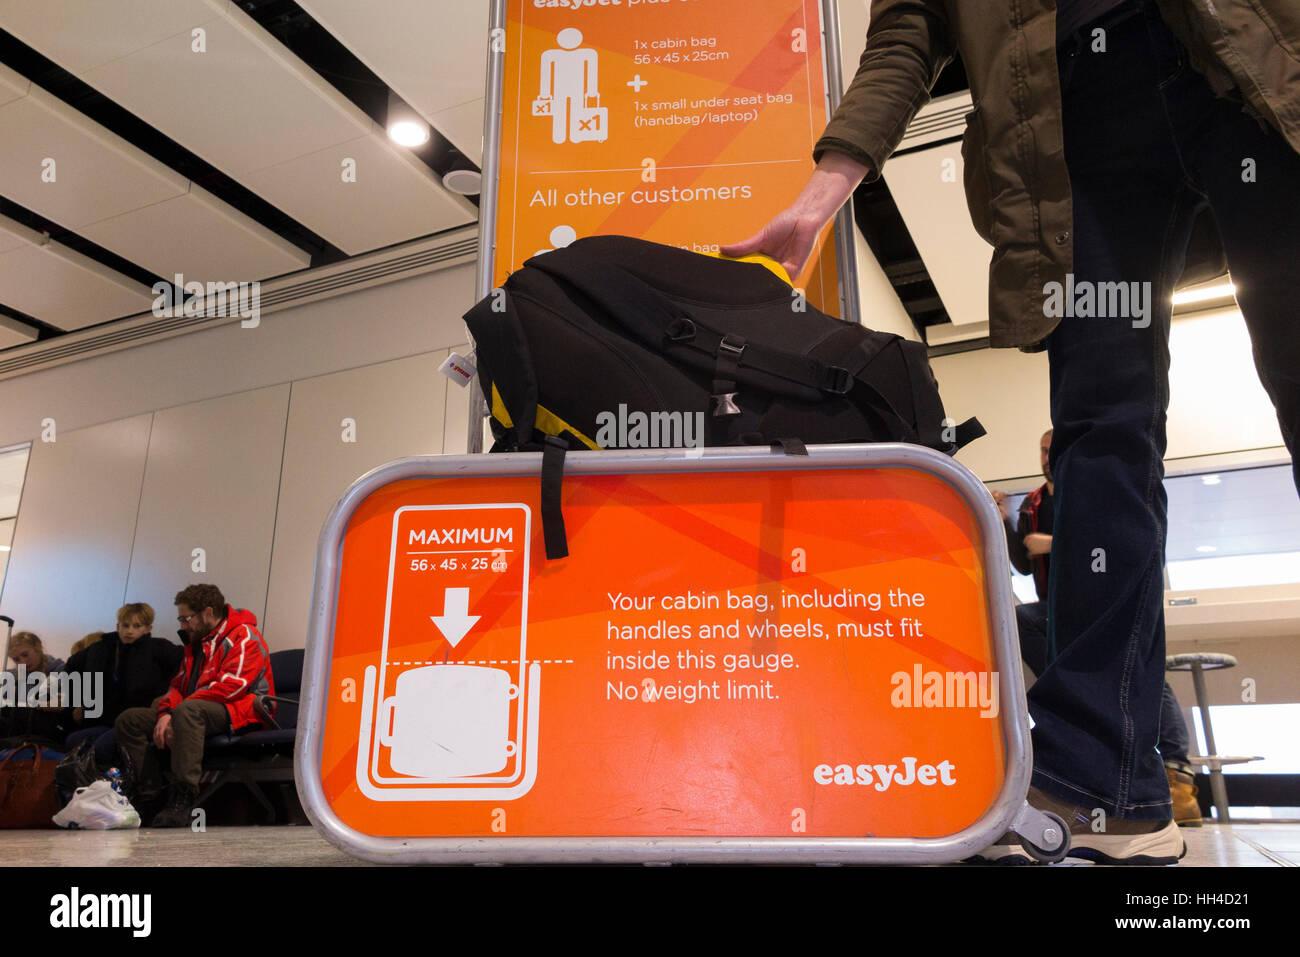 bag baggage size frame cage tester measure dimensions of passenger stock photo 131019785 alamy. Black Bedroom Furniture Sets. Home Design Ideas